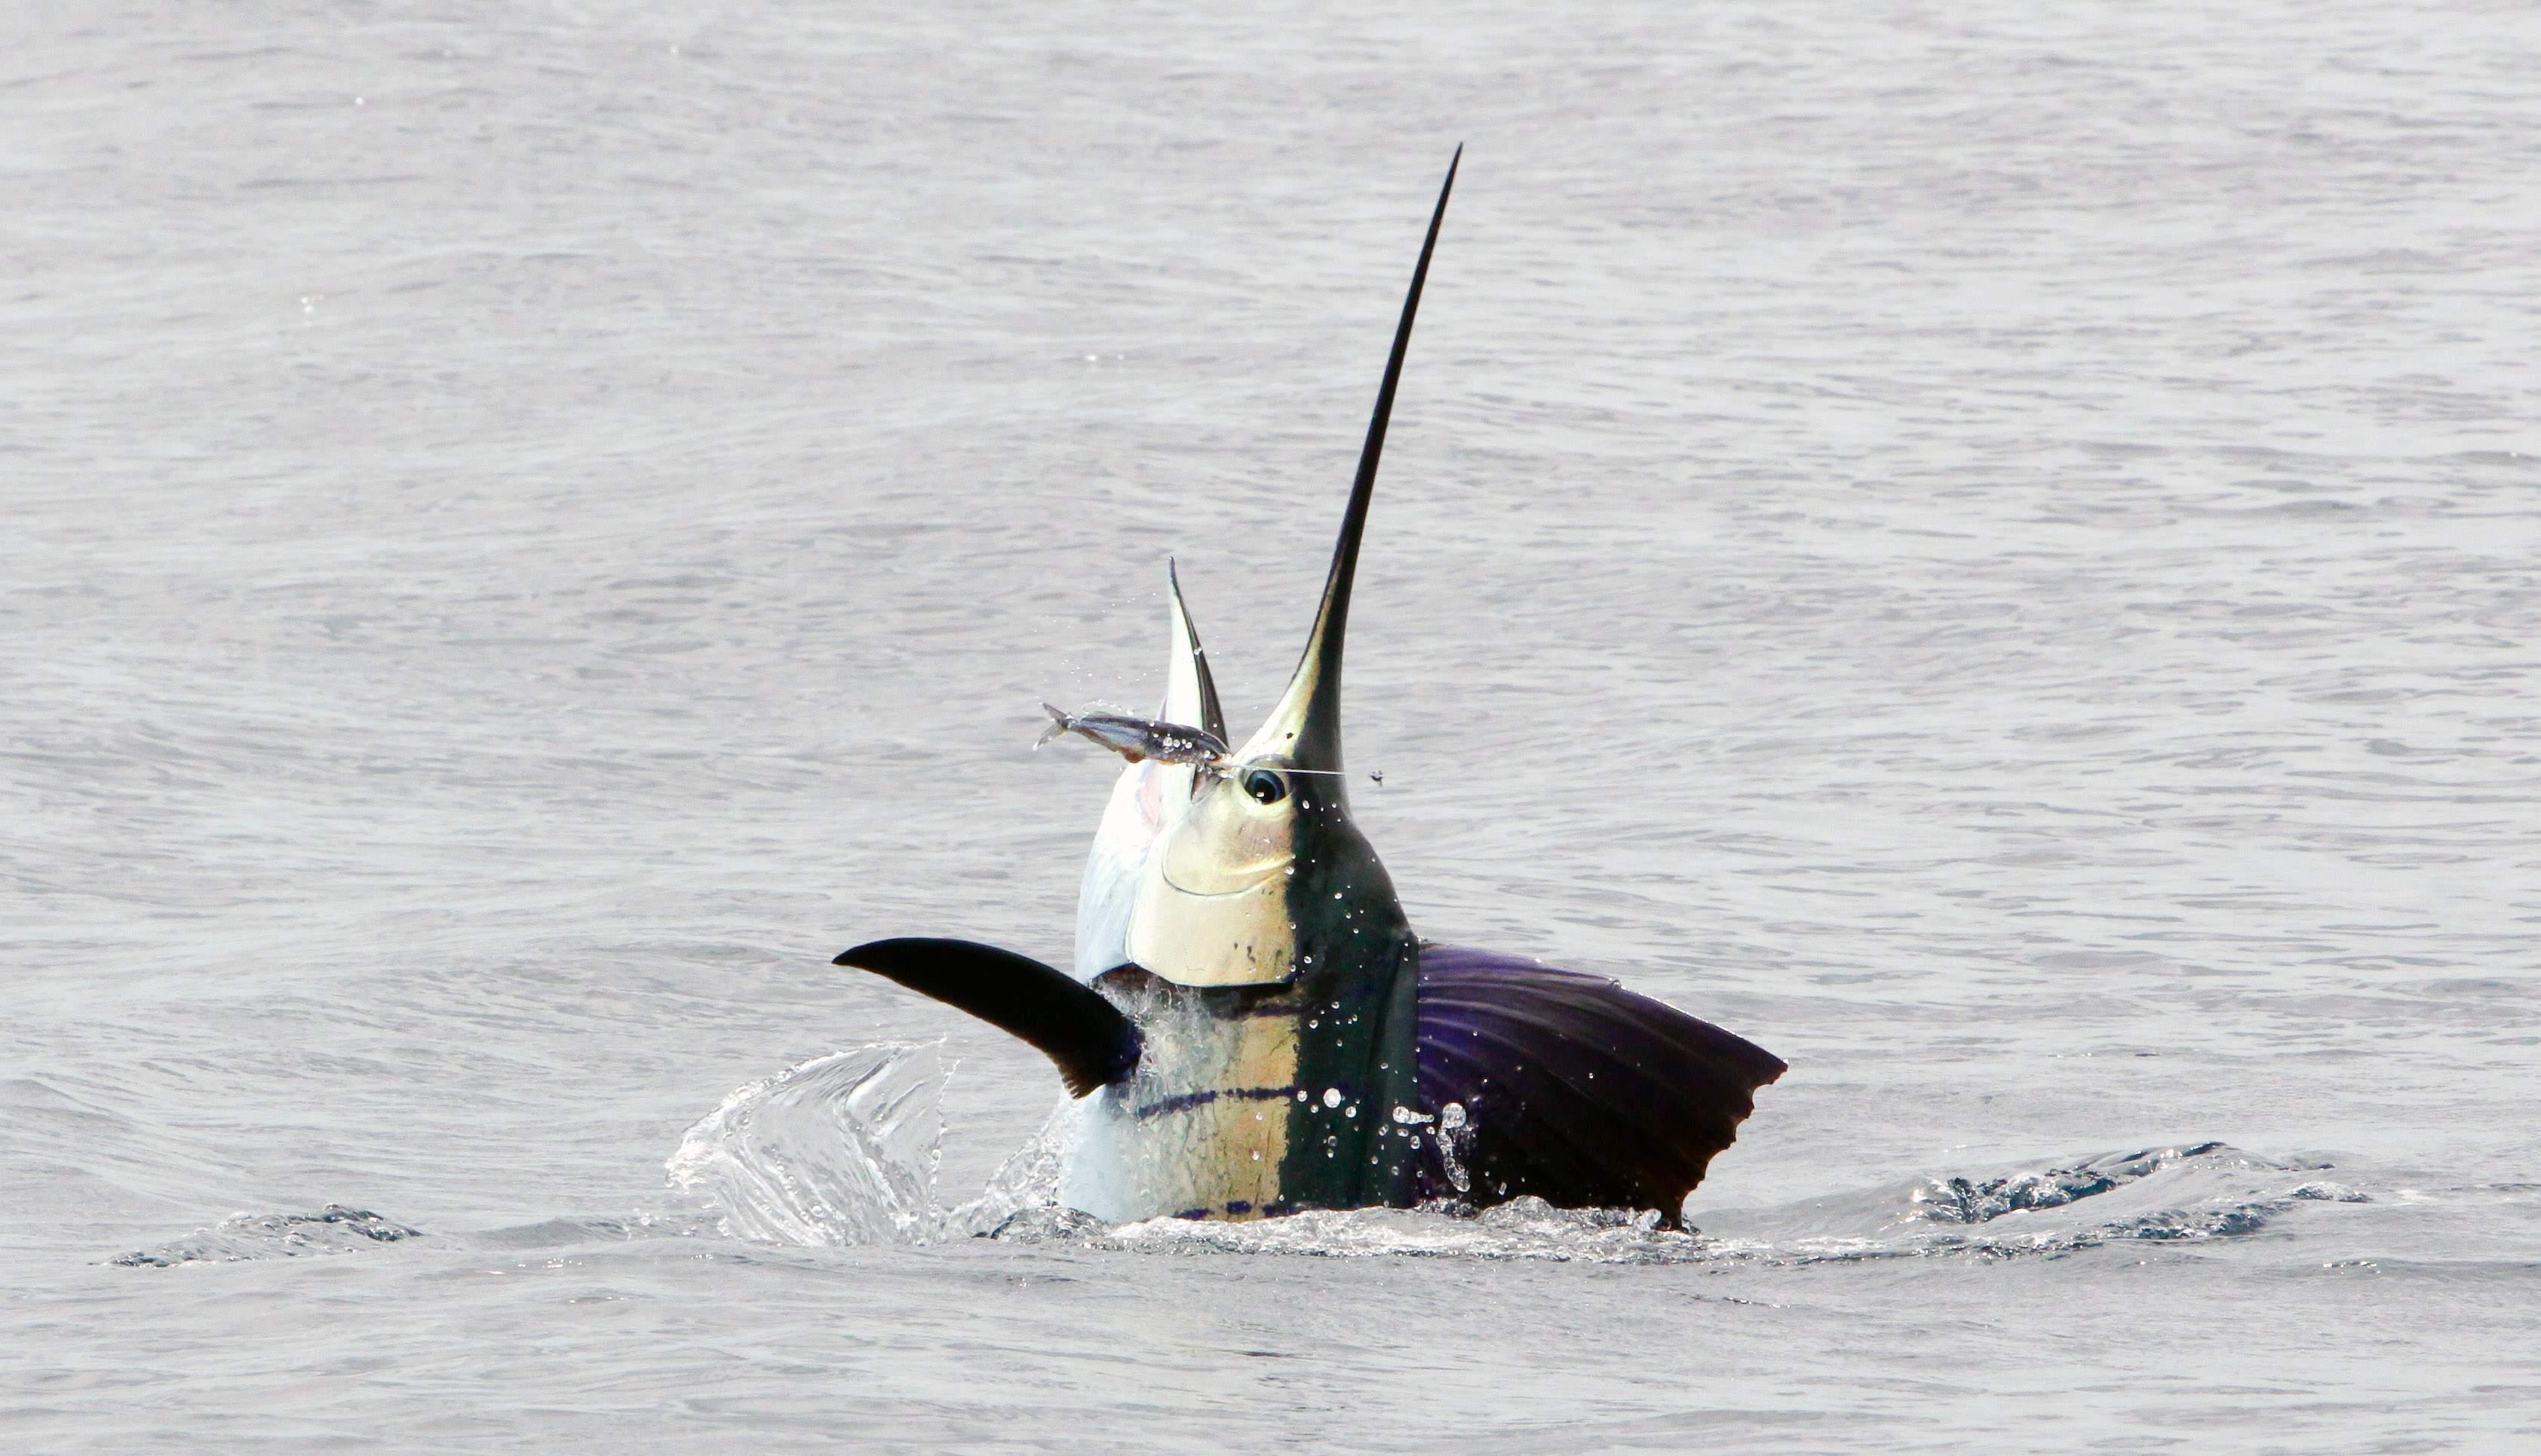 Pelagic Gear Species Profile Sailfish 8